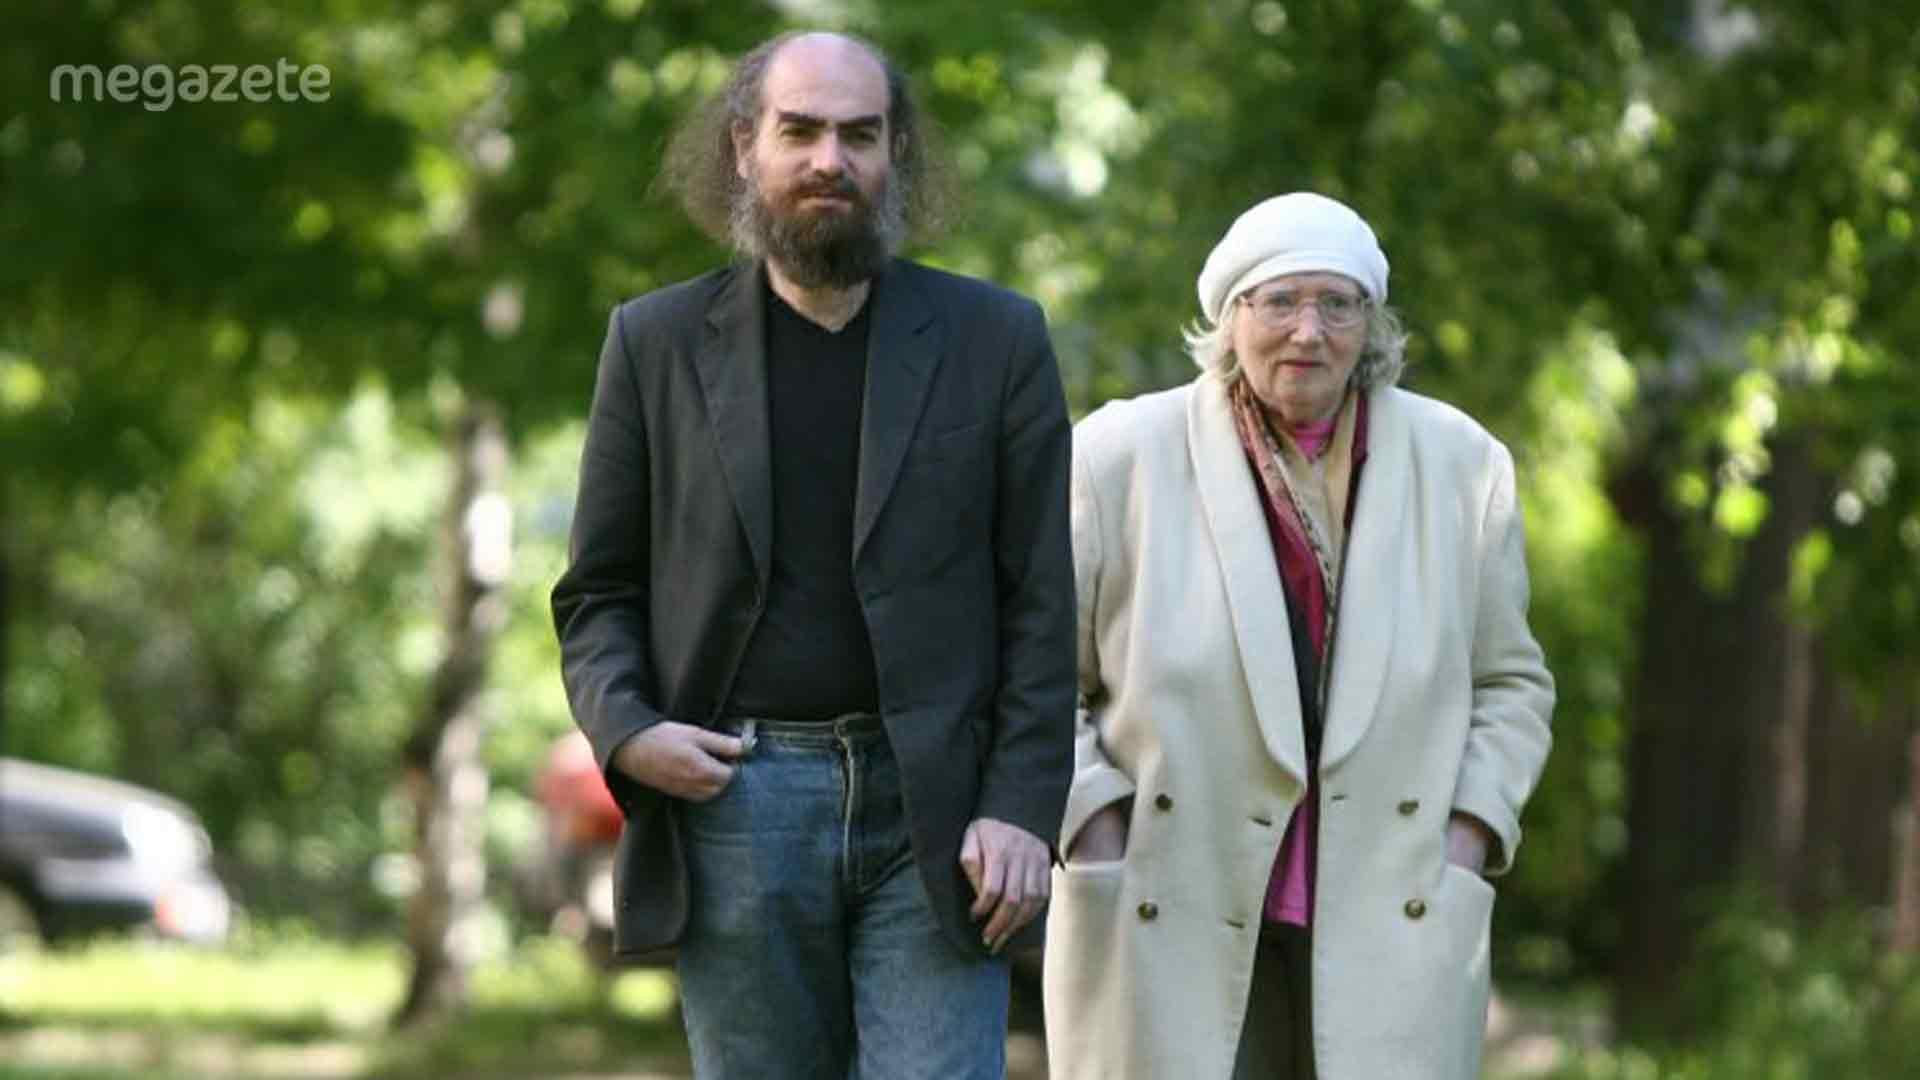 Grigori Yakovlevich Perelman ve Annesi